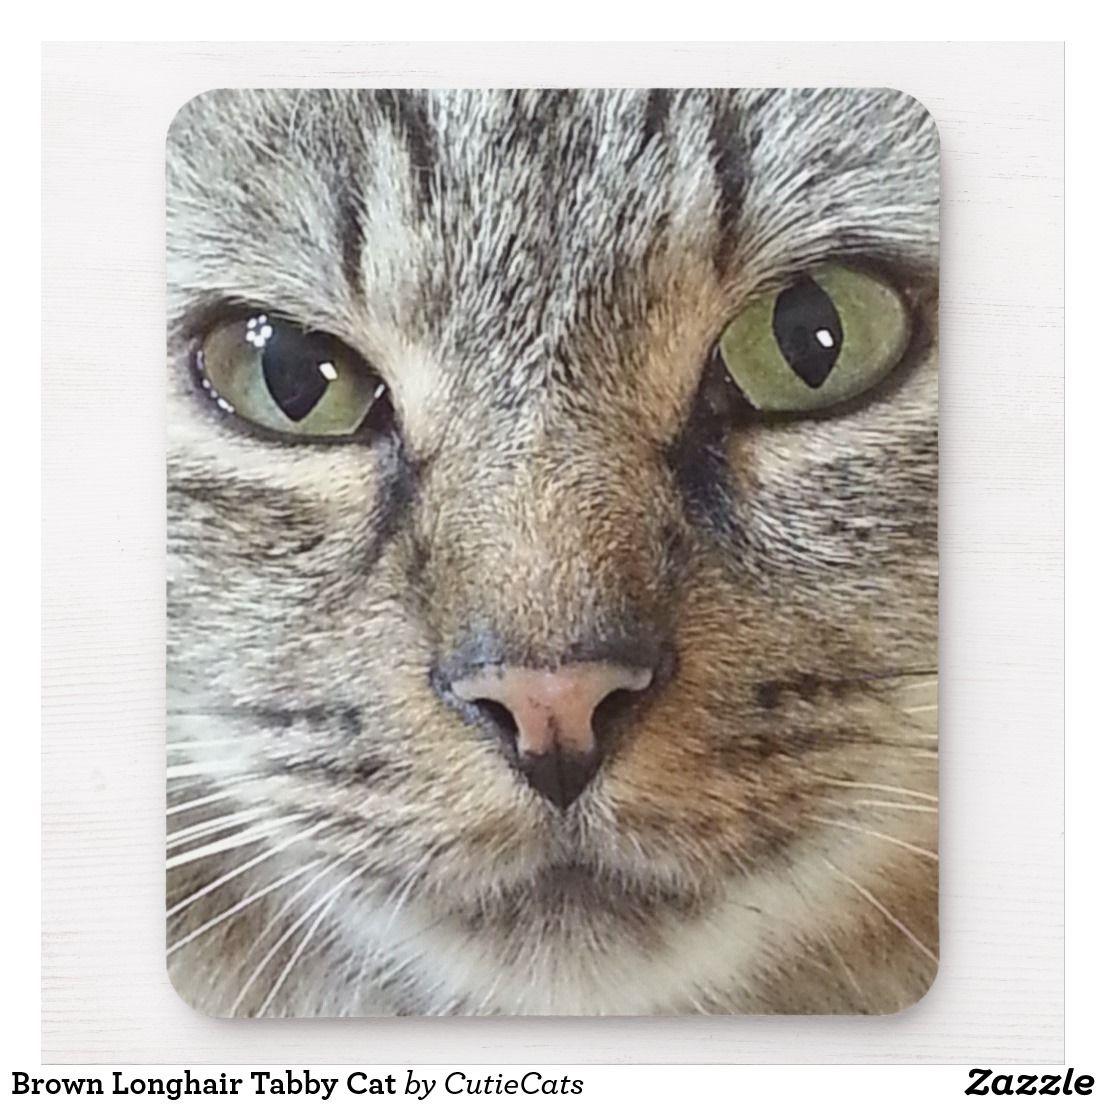 Brown Longhair Tabby Cat Mouse Pad Zazzle Com Tabby Cat Tabby Cat Pictures Orange Tabby Cats